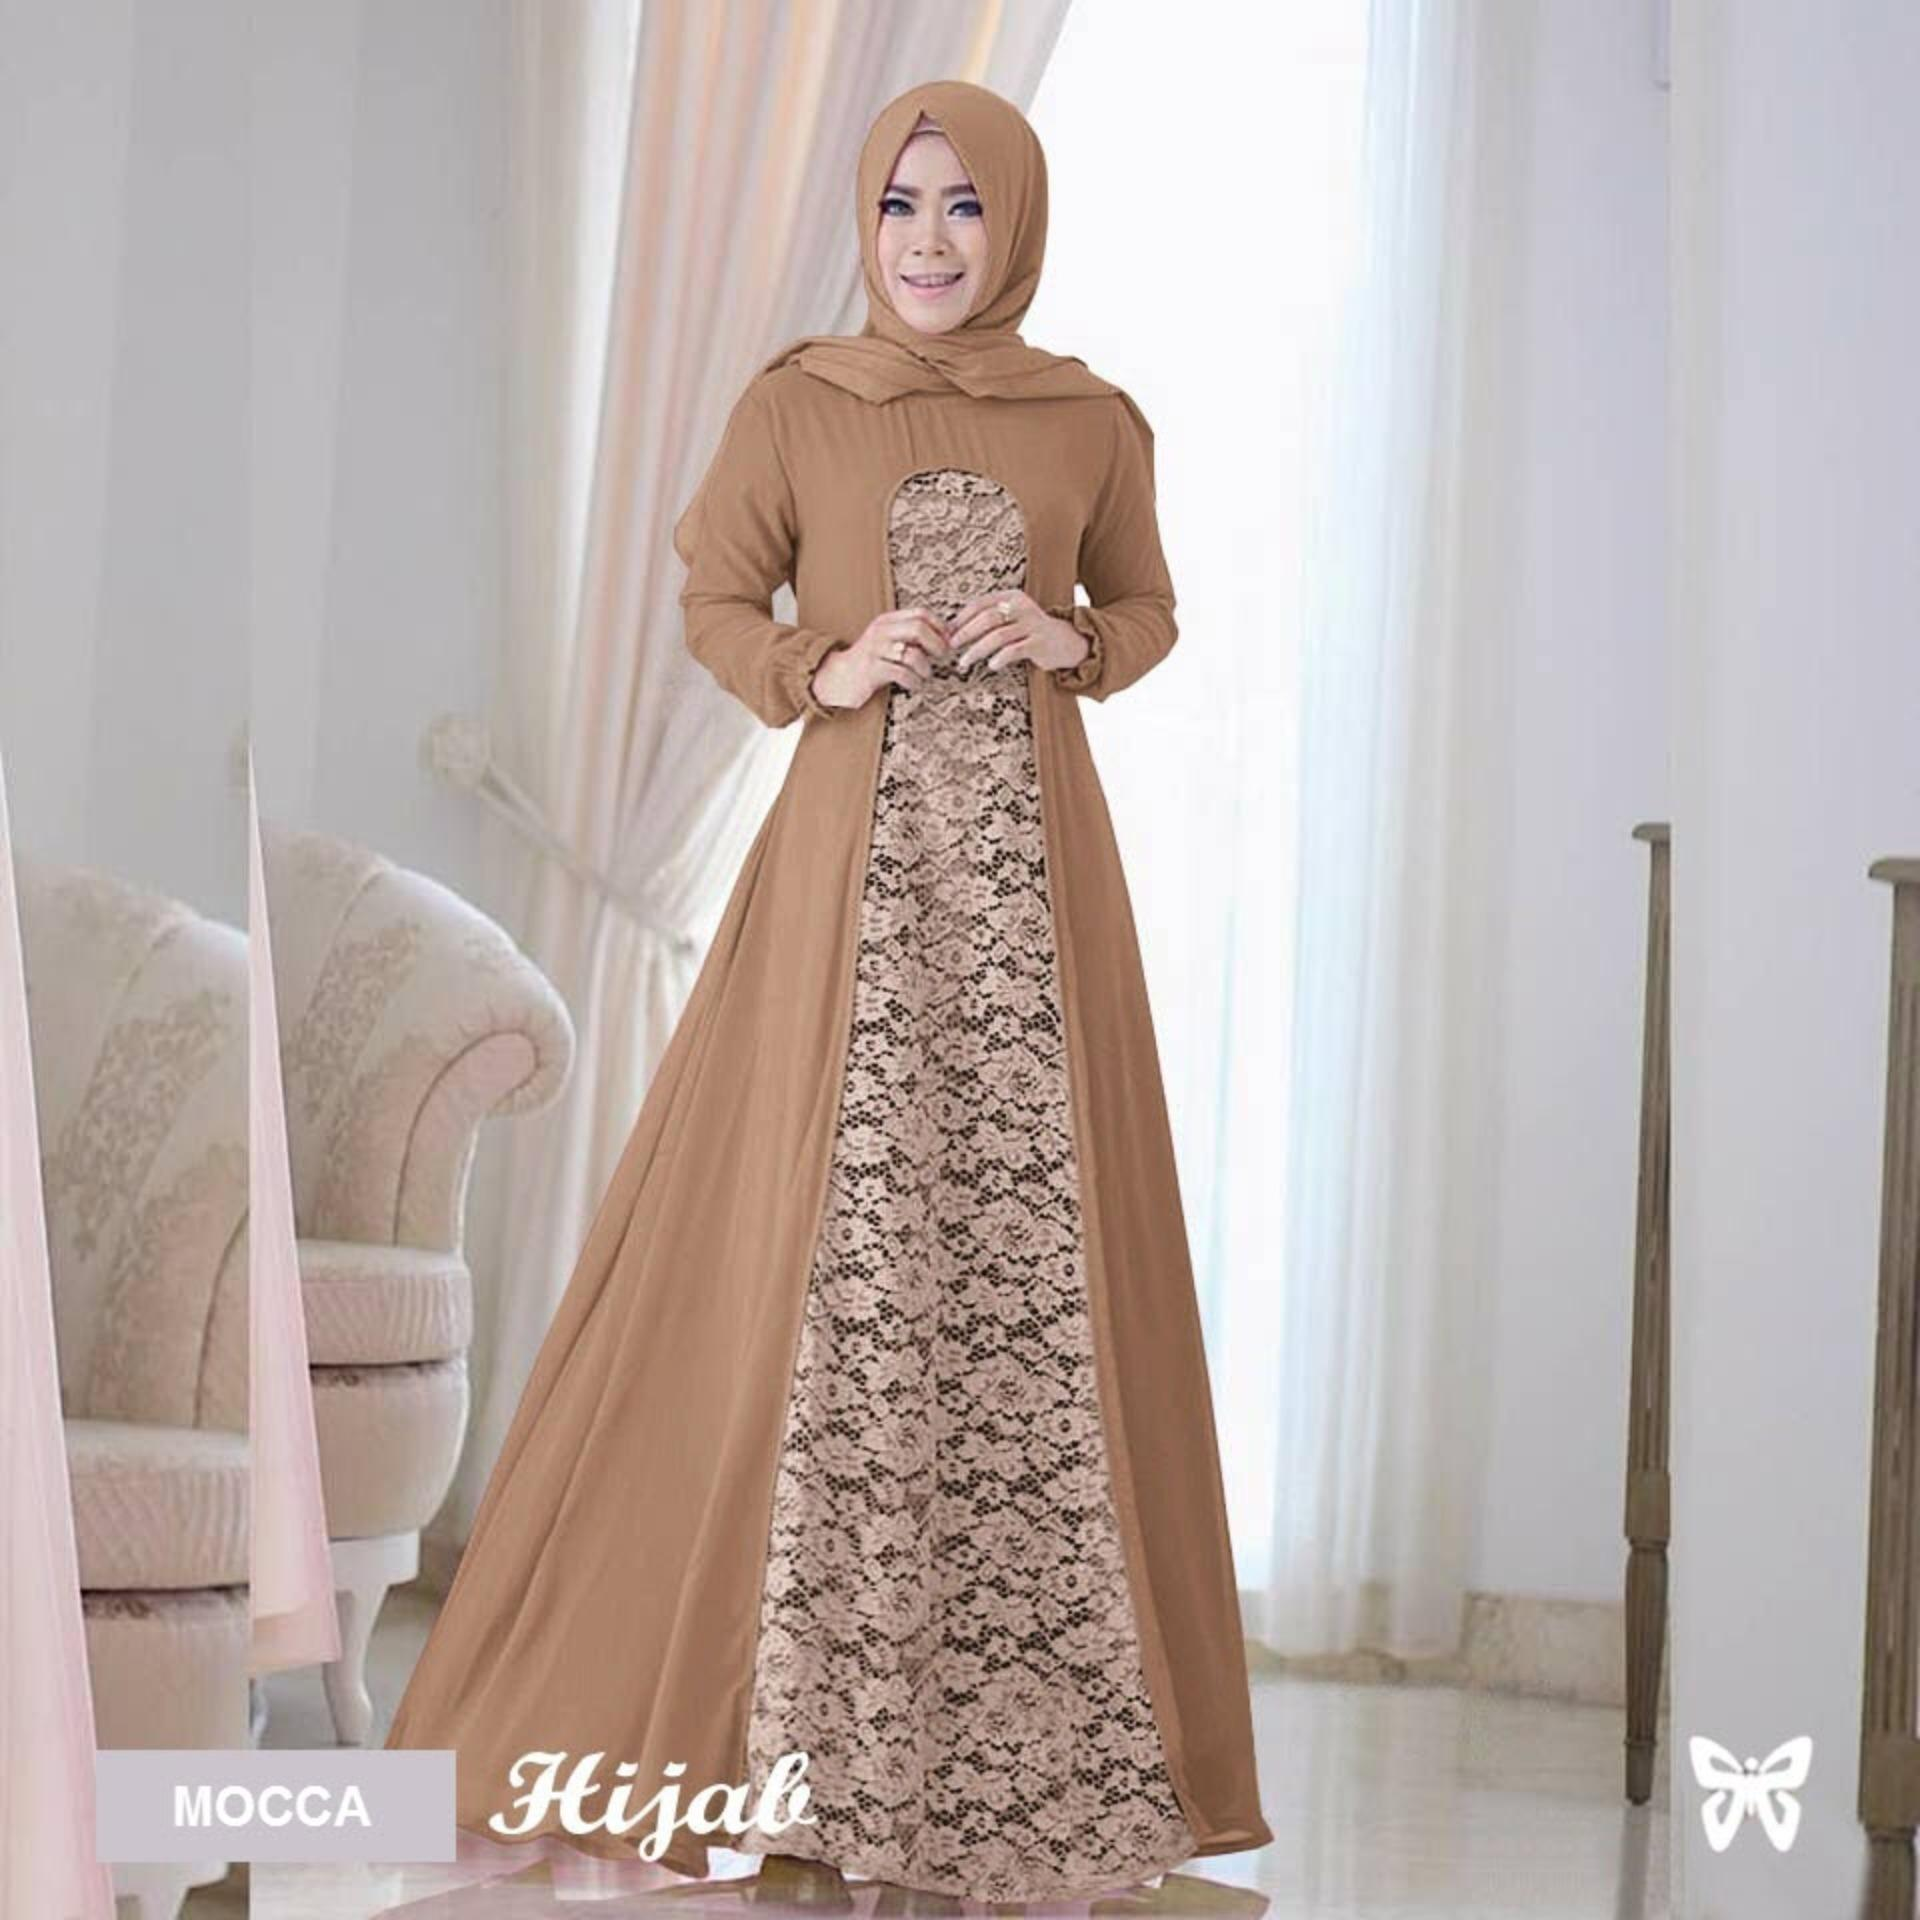 Sera Outfit Maxi Dress Lengan Panjang Set 2 in 1 MSR055 / Gamis Syari / Gaun Pesta Muslimah / Baju Muslim Wanita Syar'i / Hijab / Srrayta